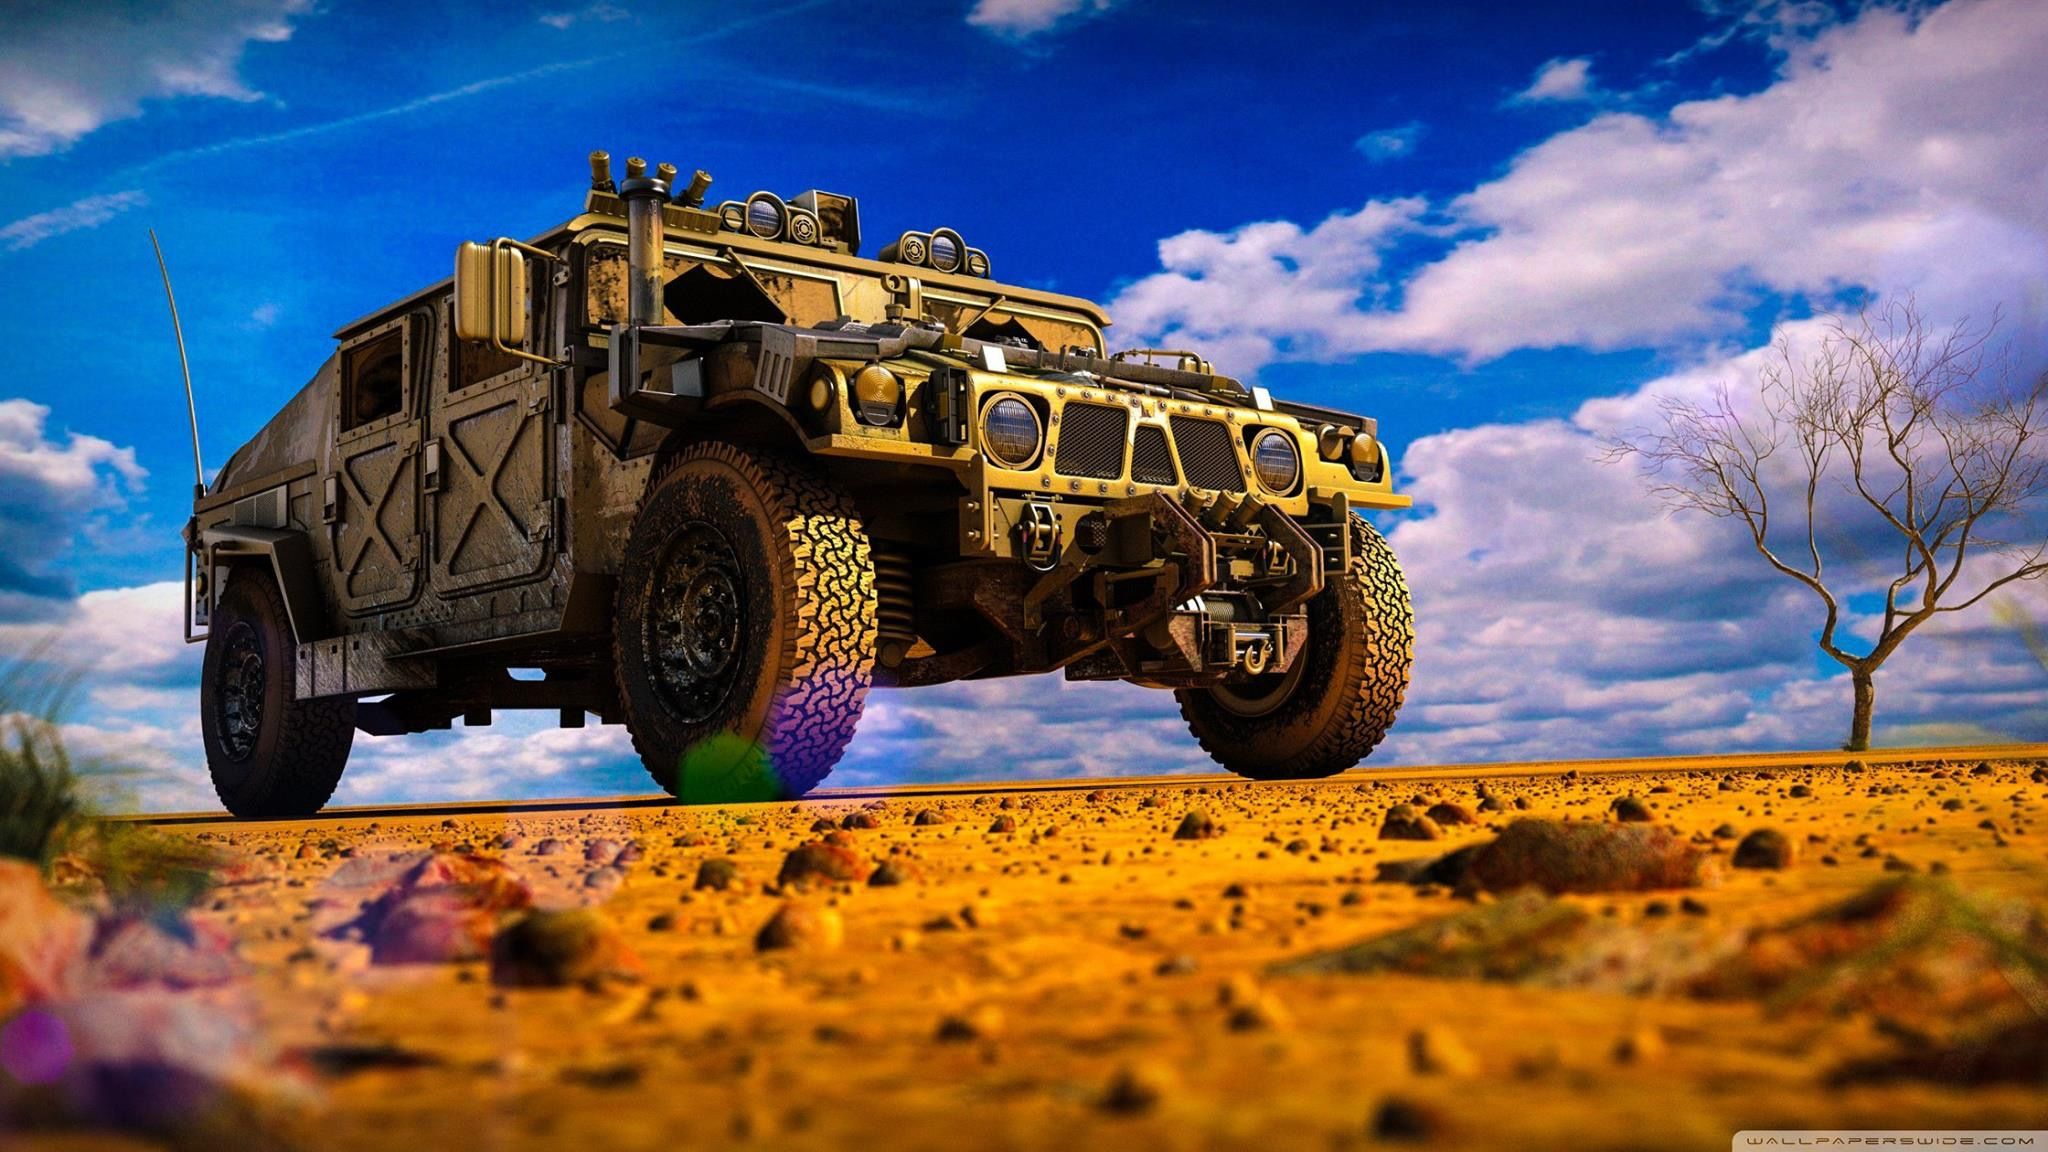 Army Wallpaper, Hd Wallpaper, Hummer Cars, Hummer H2, Love Car, Military